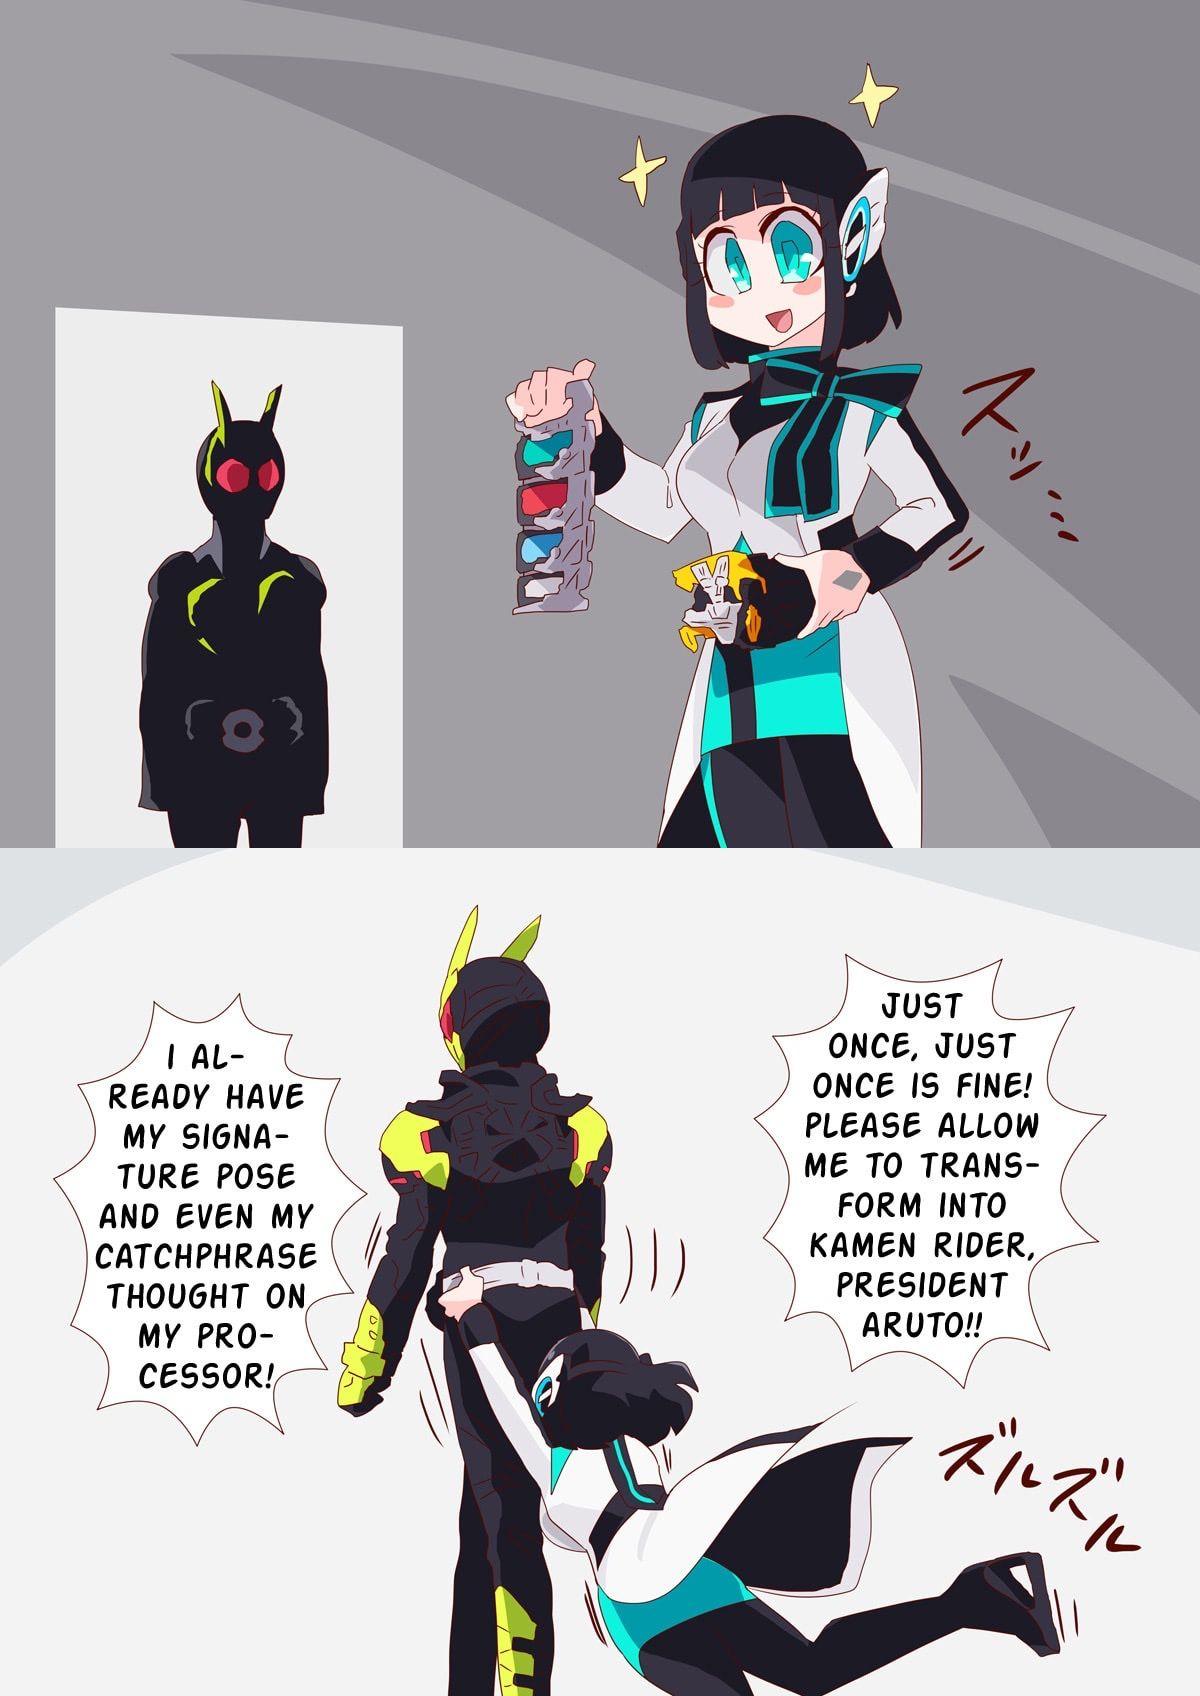 Pin by Aron Molina on Kamen Sentai Rangers Rider in 2020